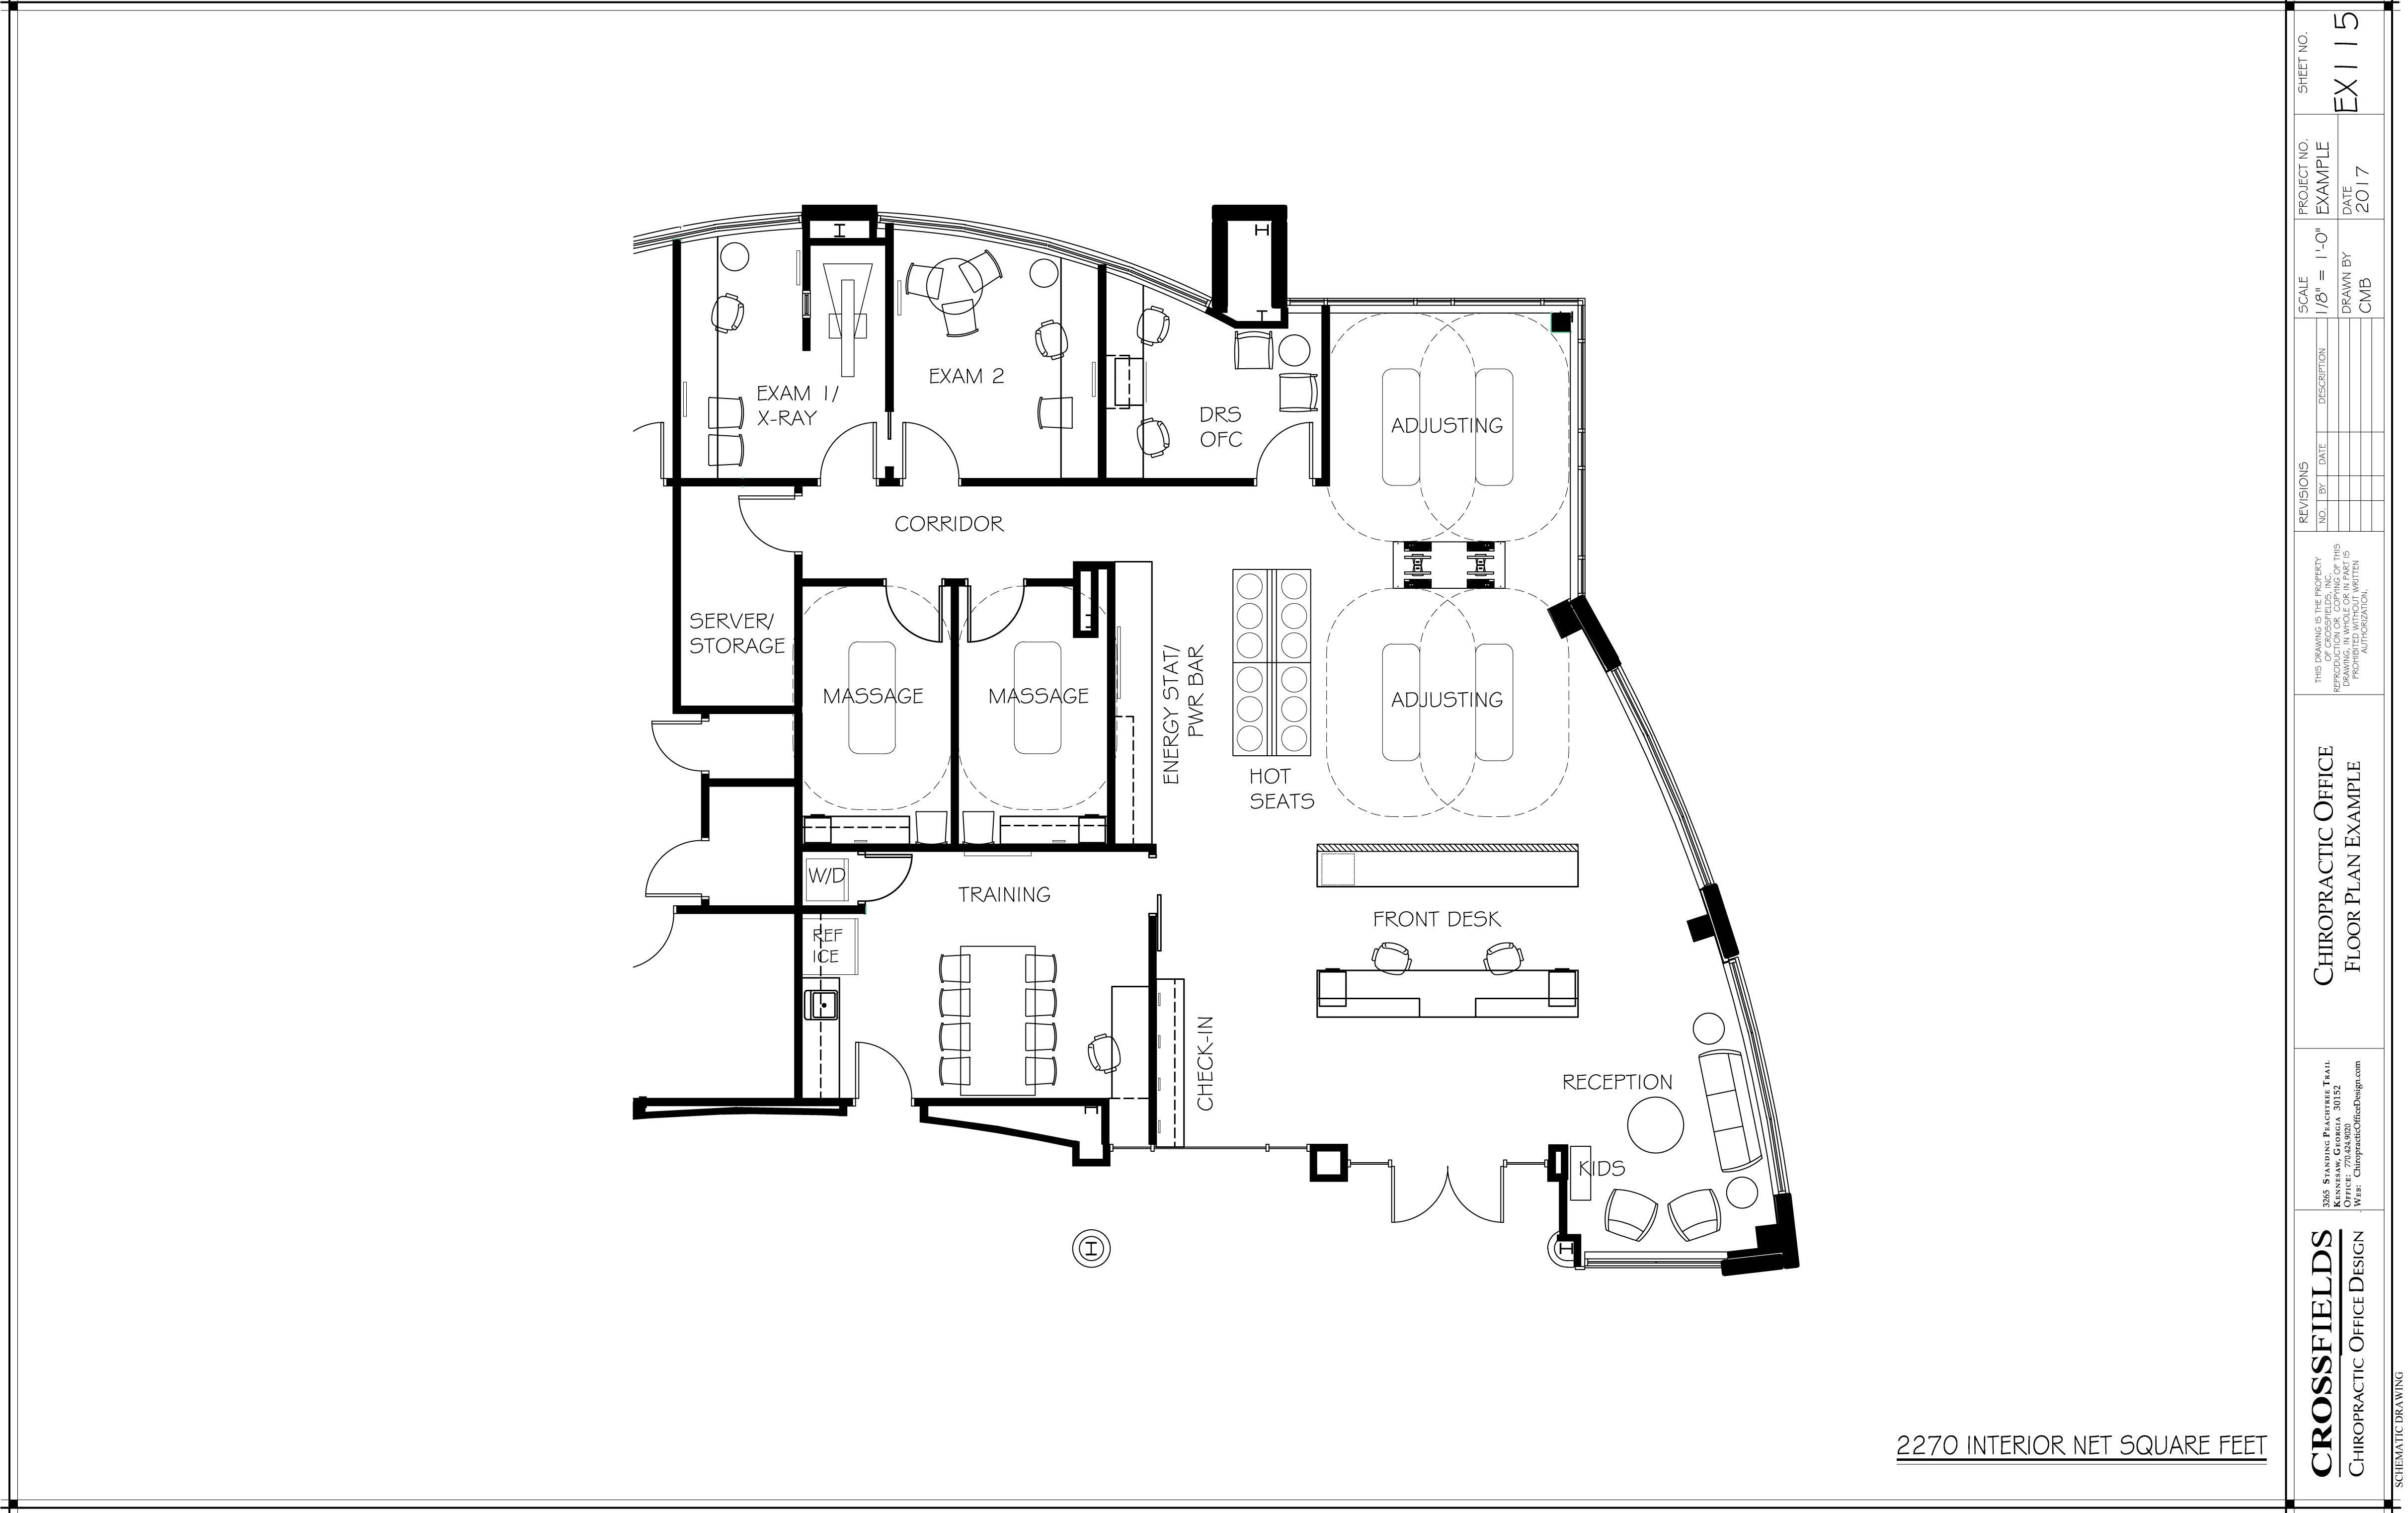 Example Of Chiropractic Office Floor Plan With Massage Combined Xray Exam  Open Adjusting Hot Seats